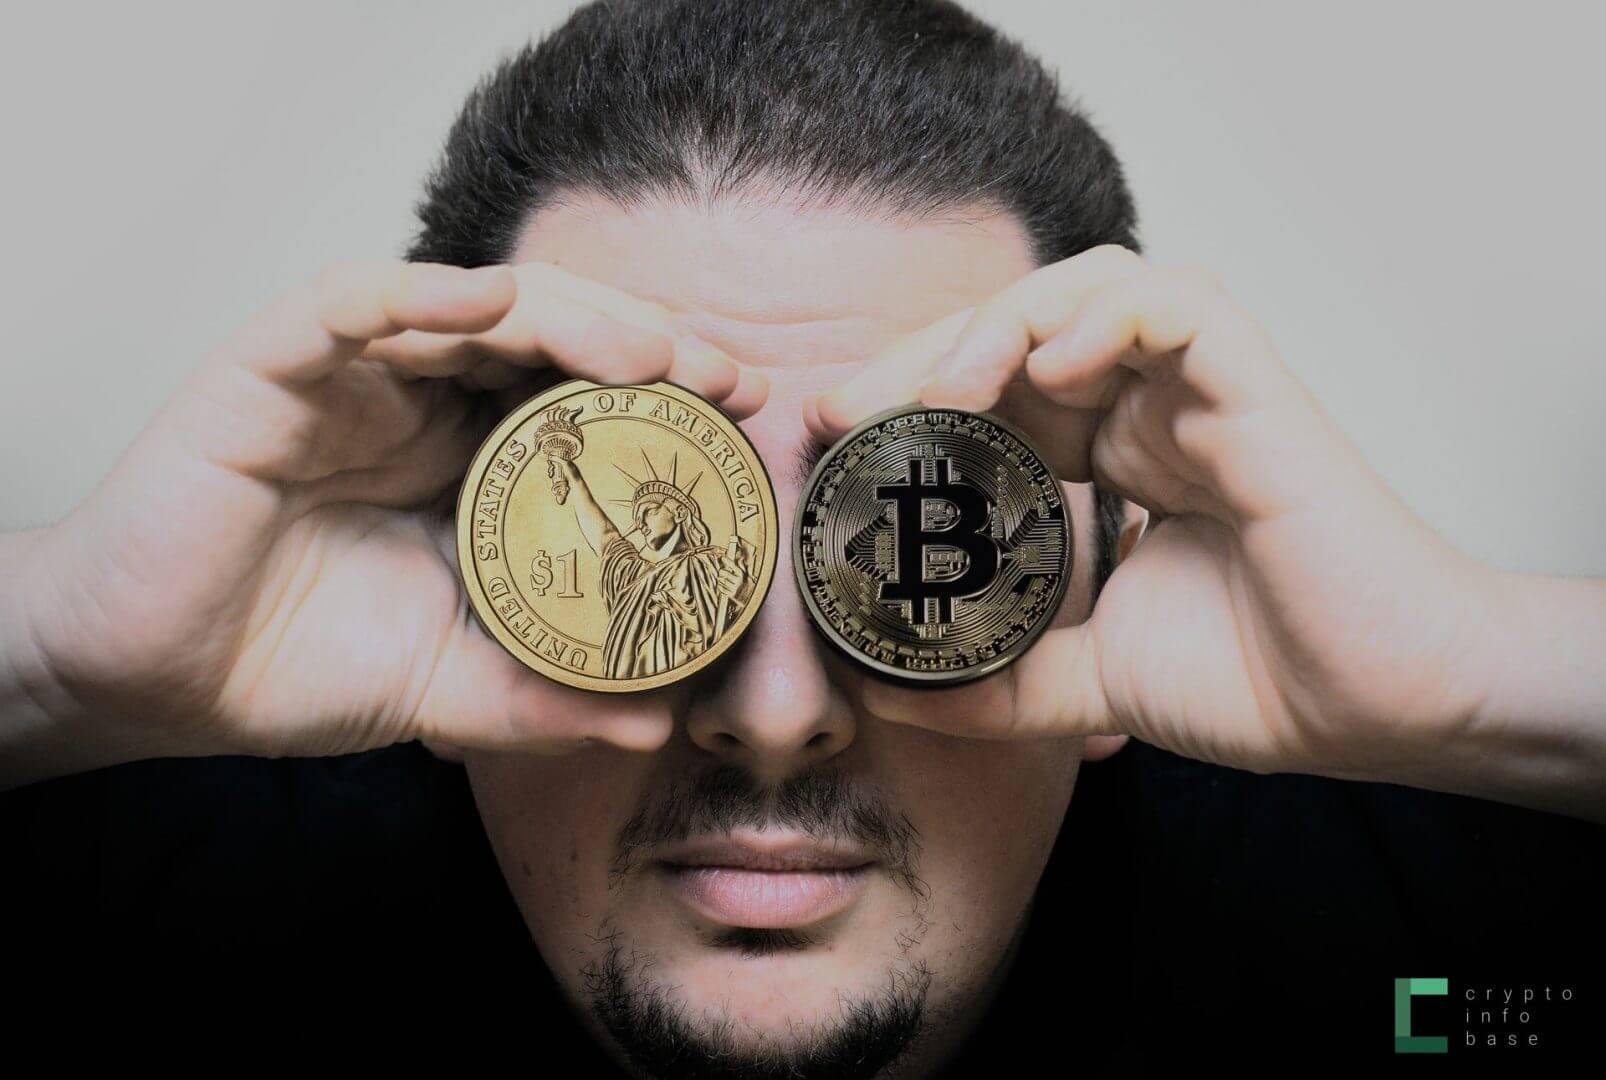 Bitcoin (BTC) Price Prediction 2018, 2019, 2020 – Will the Crypto Surge?